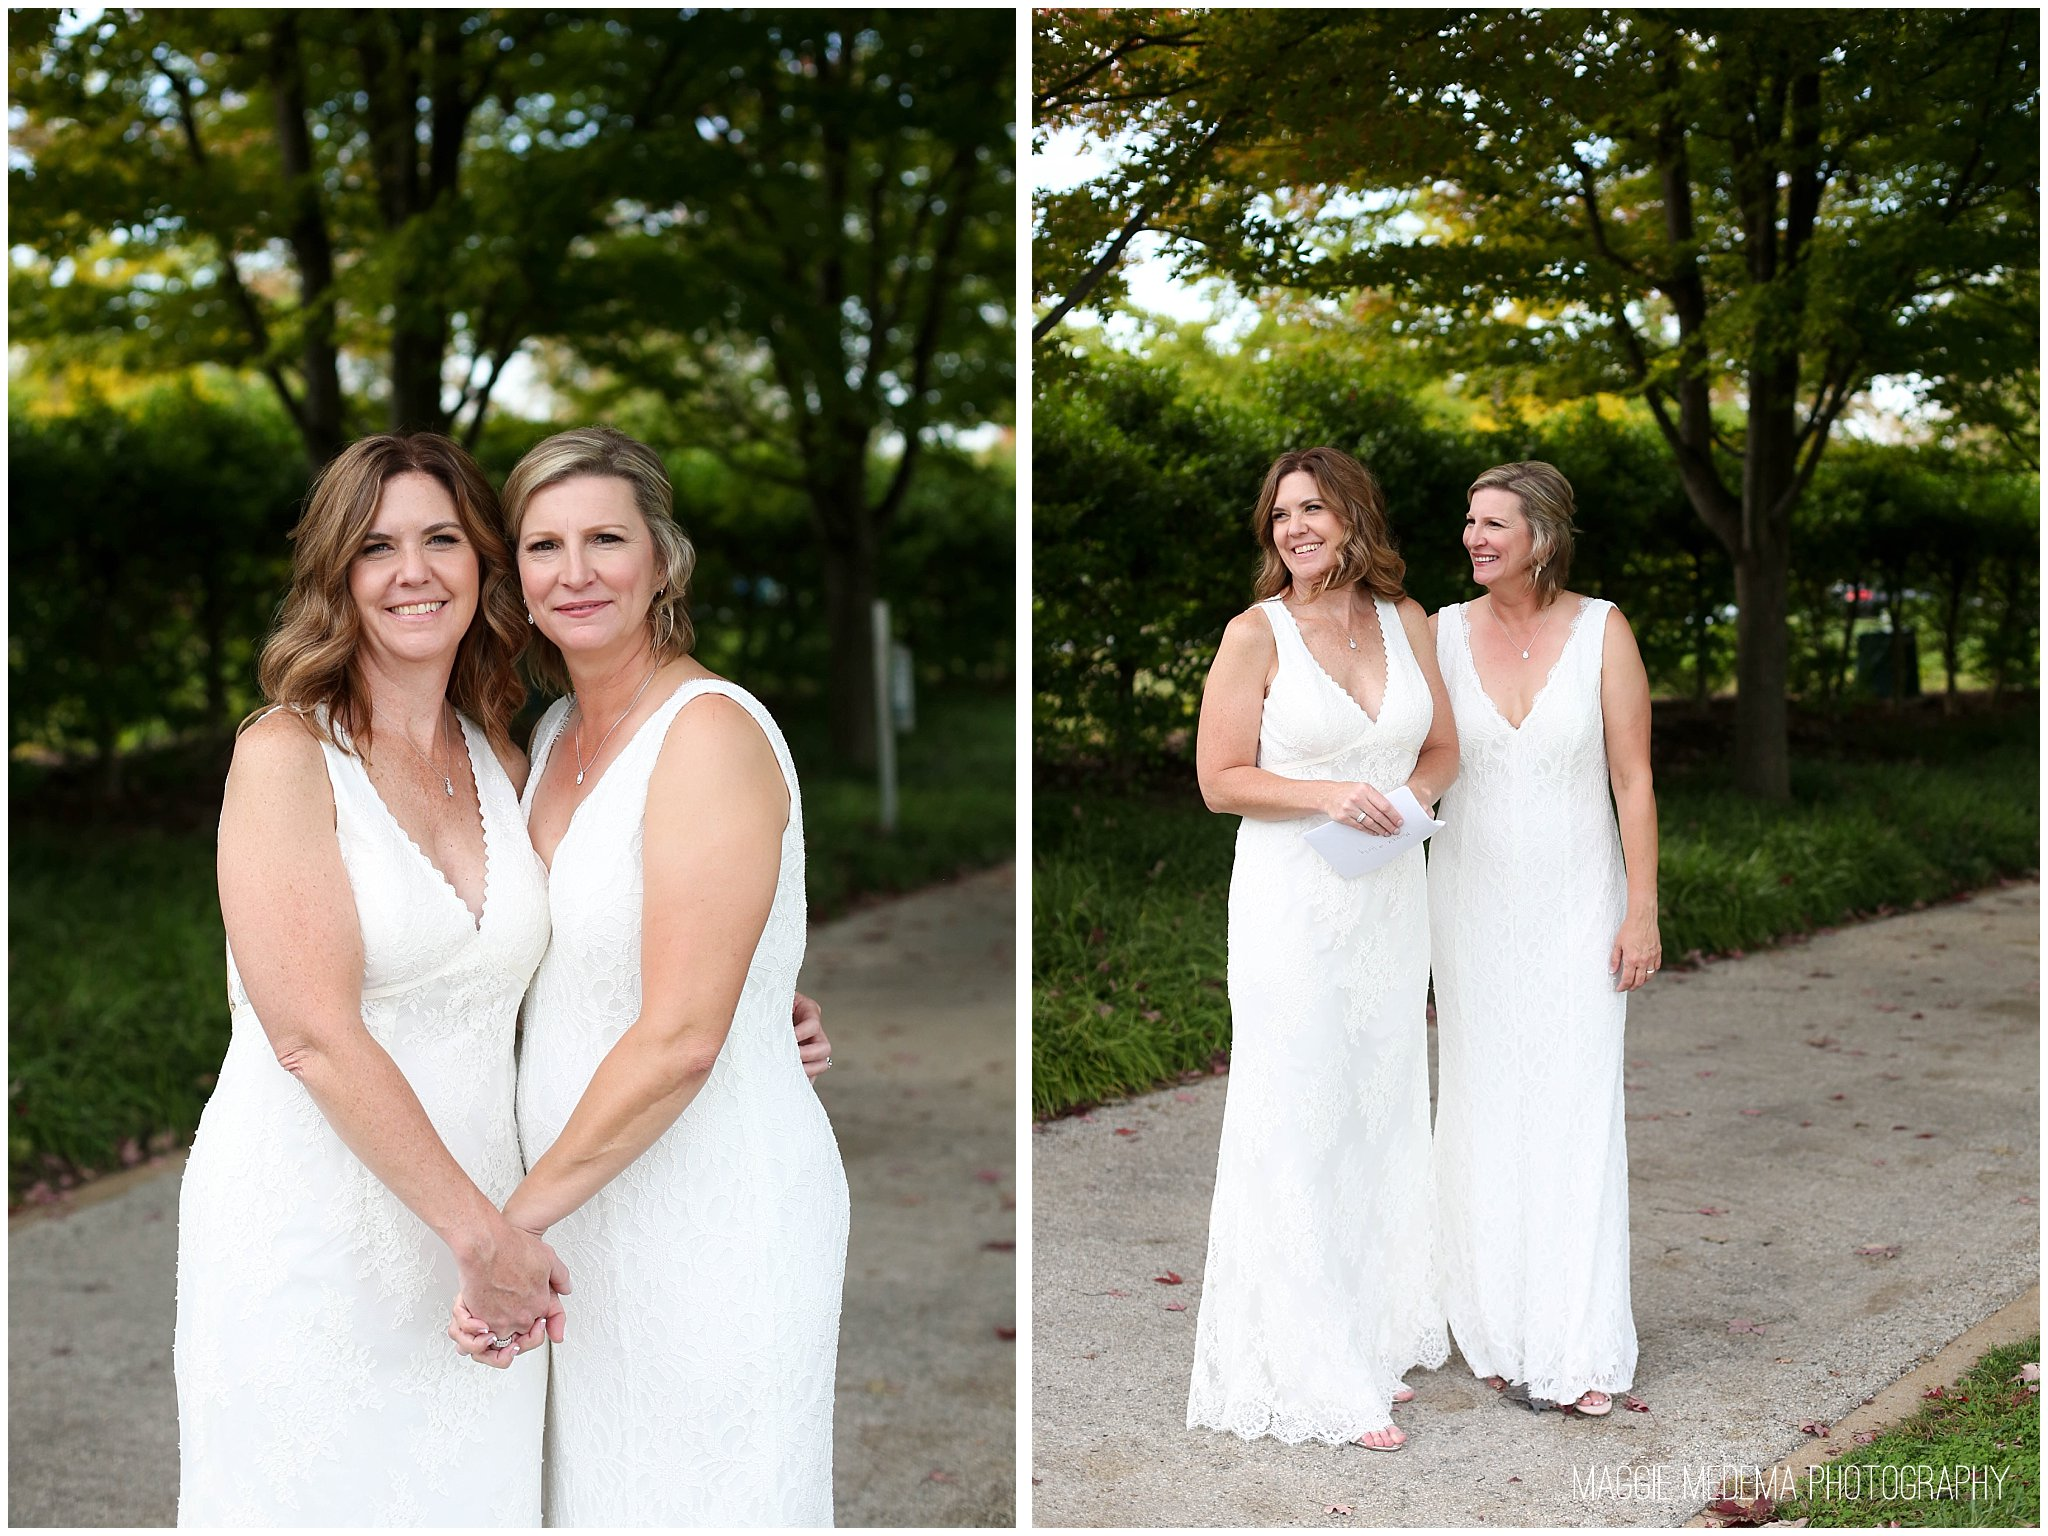 St. Louis Same Sex Wedding Photography